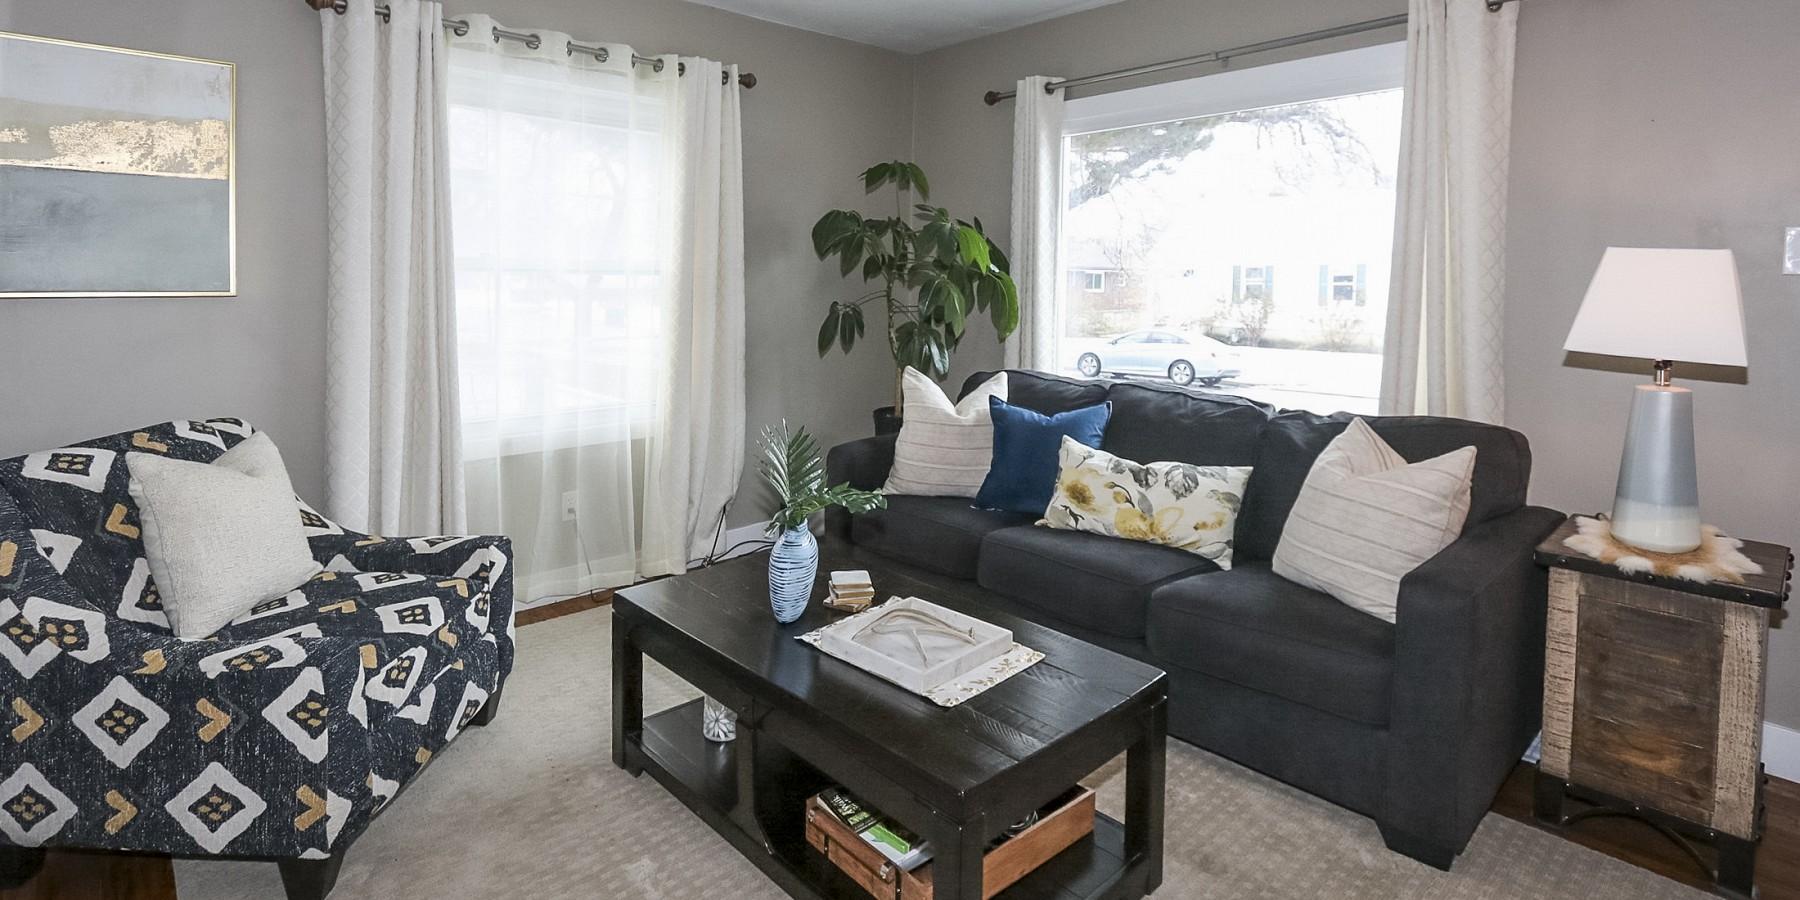 753 E. Loveland Avenue, Salt Lake City, UT 84106